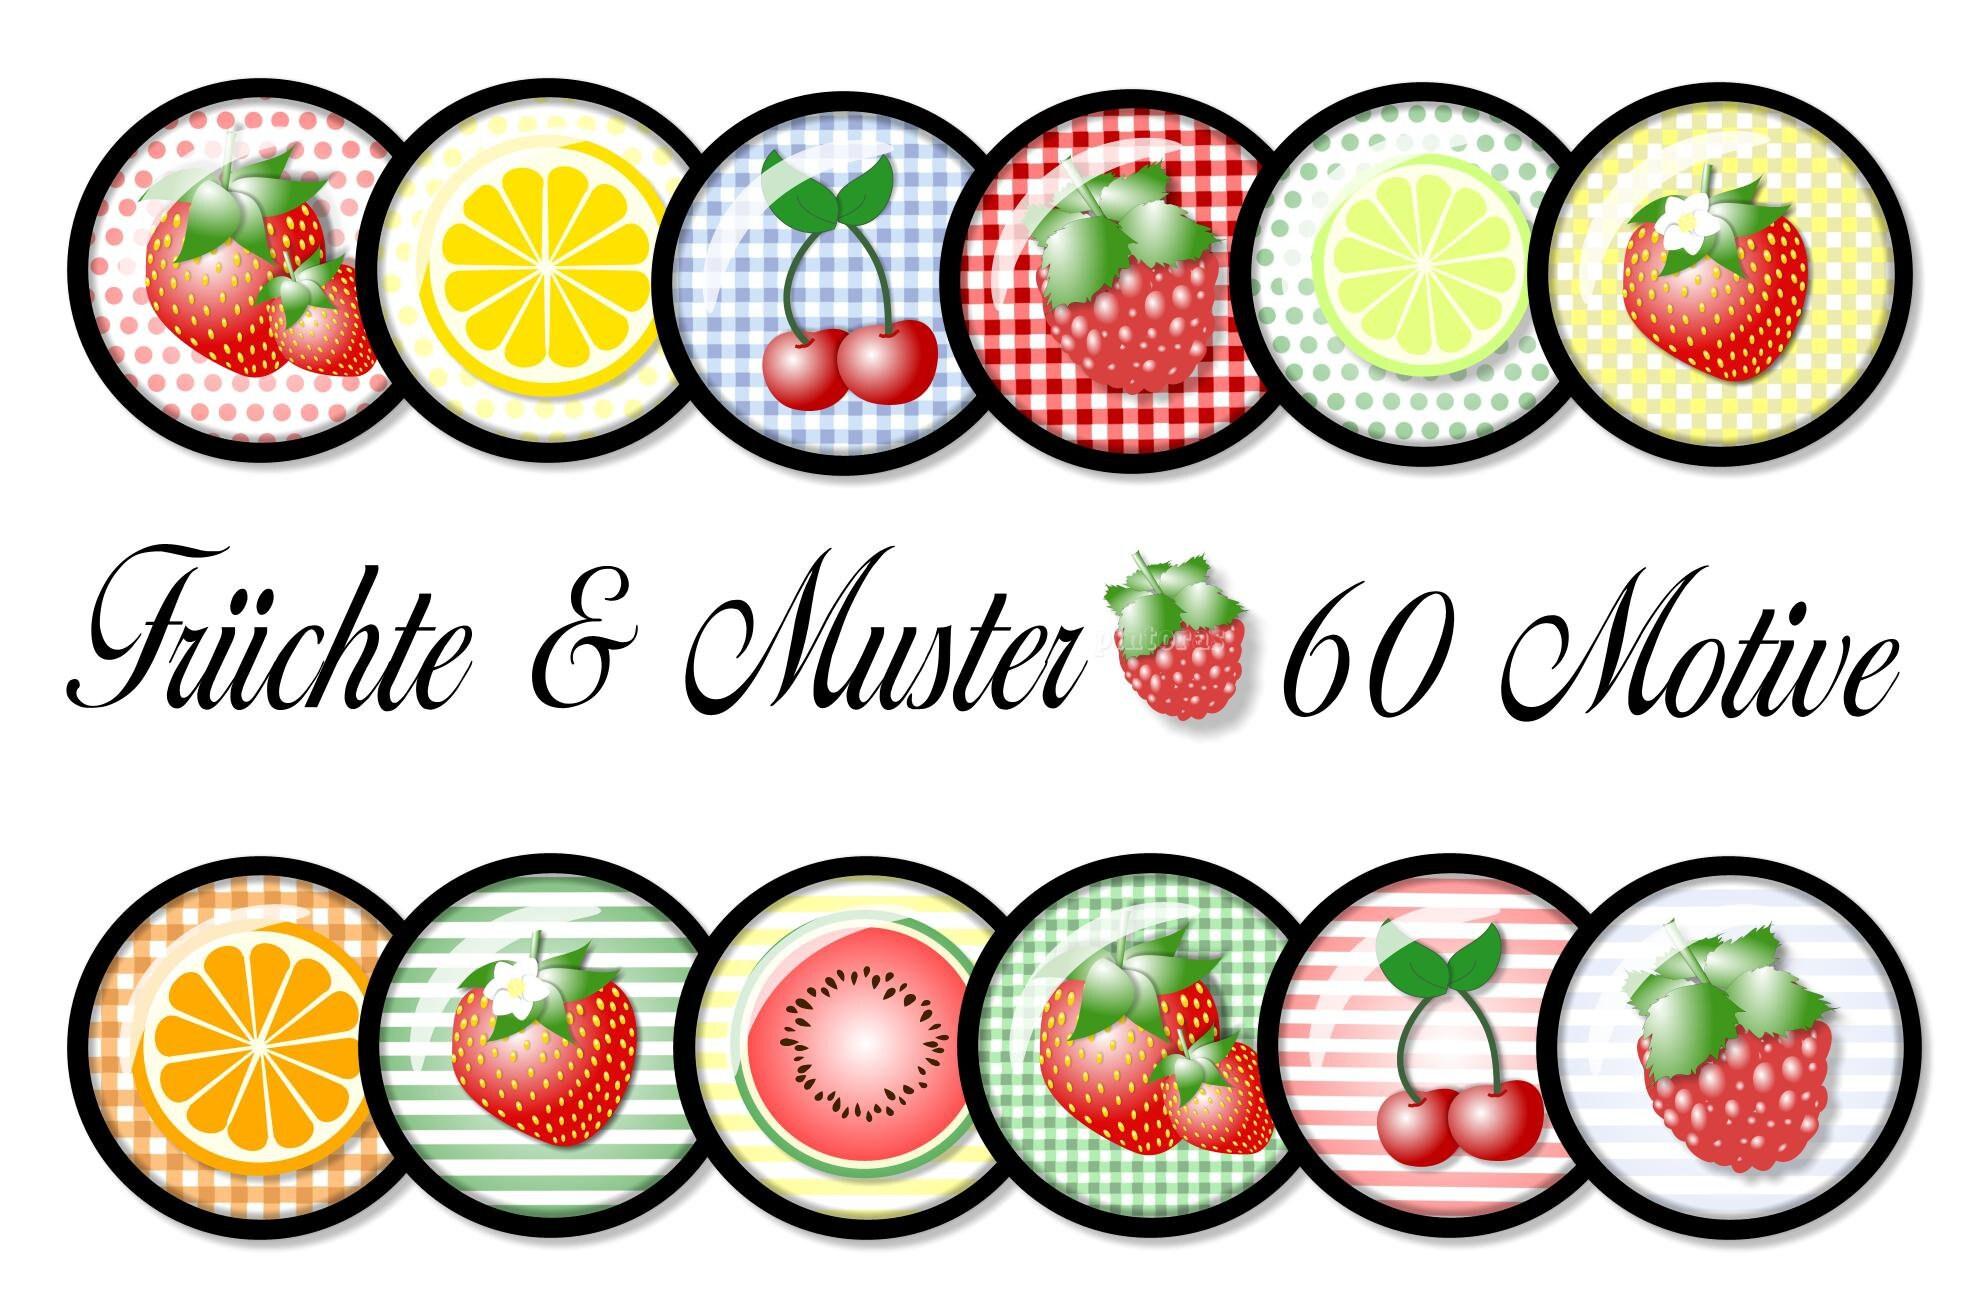 Cabochon-Vorlagen digital Früchte & Muster 60 süße Motive   Etsy